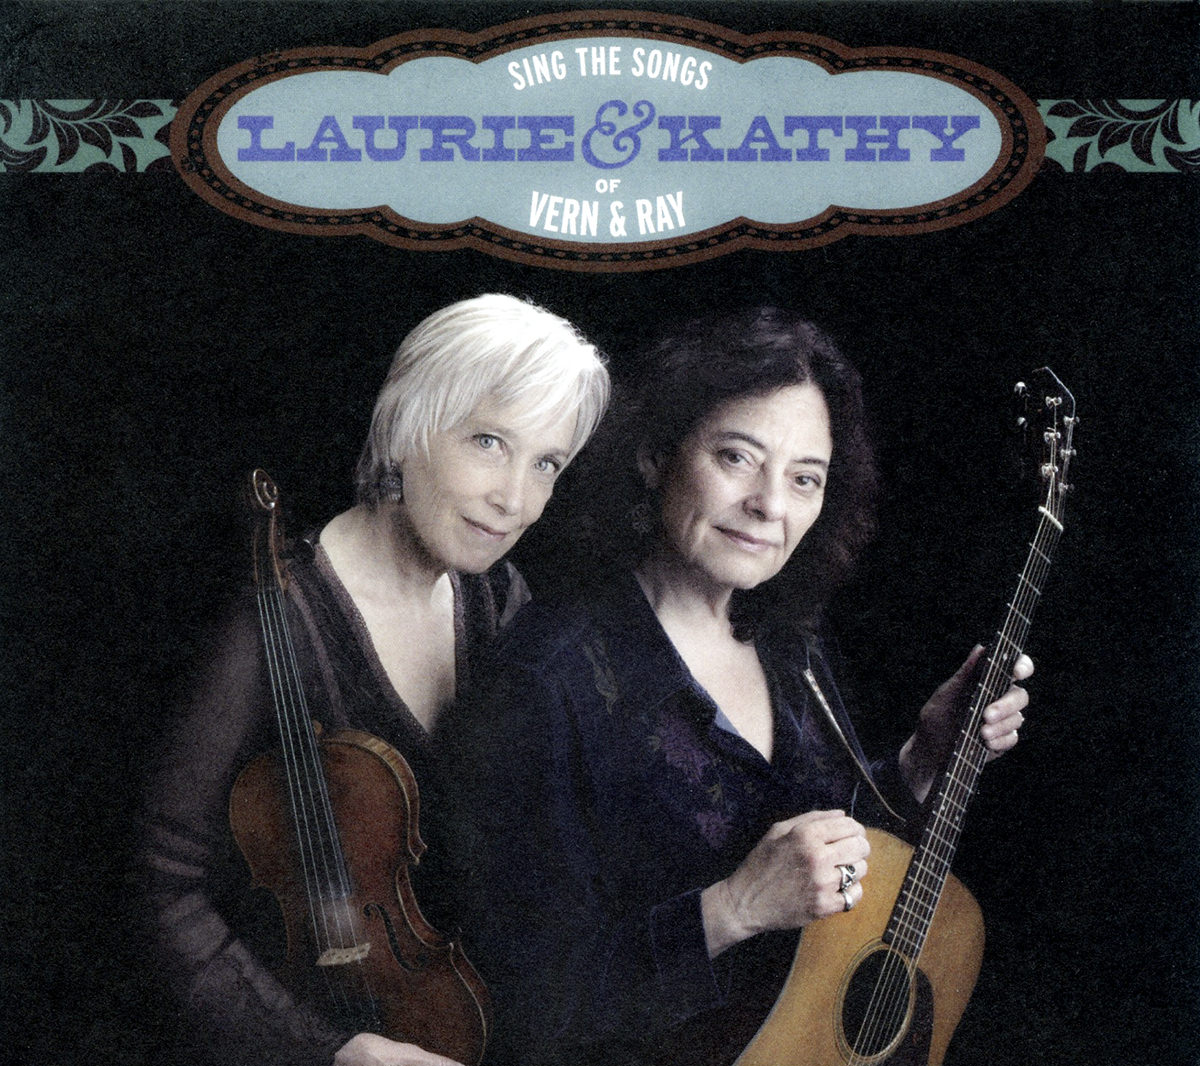 Laurie Lewis & Kathy Kallick Sing Vern & Ray